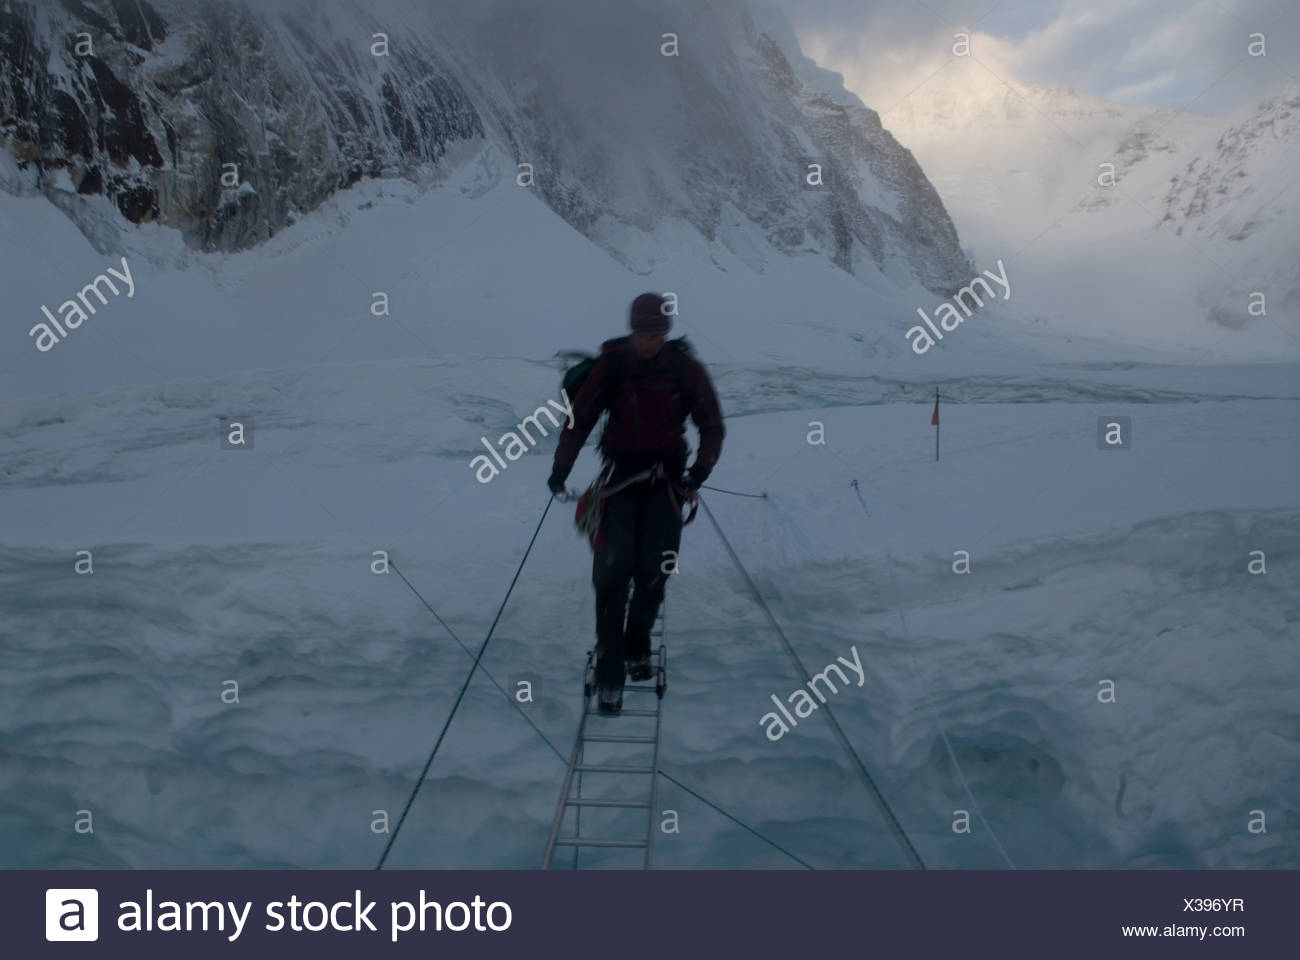 A climber crosses a crevasse, Everest's Khumbu Icefall, Nepal. - Stock Image